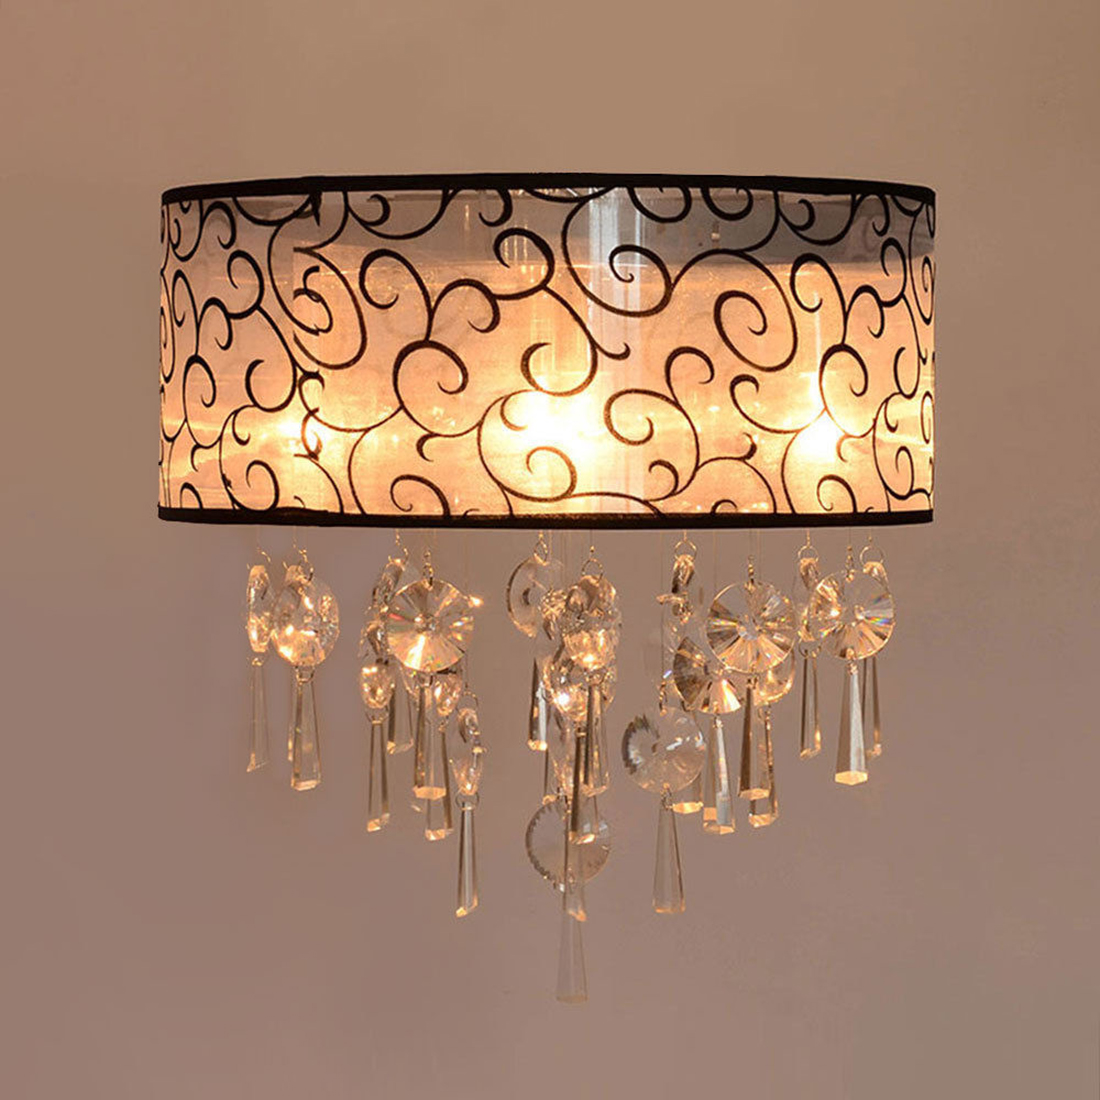 CSS Vintage Crystal Pendant   Light Lamp   Living Room+4 Lights HI5<br>